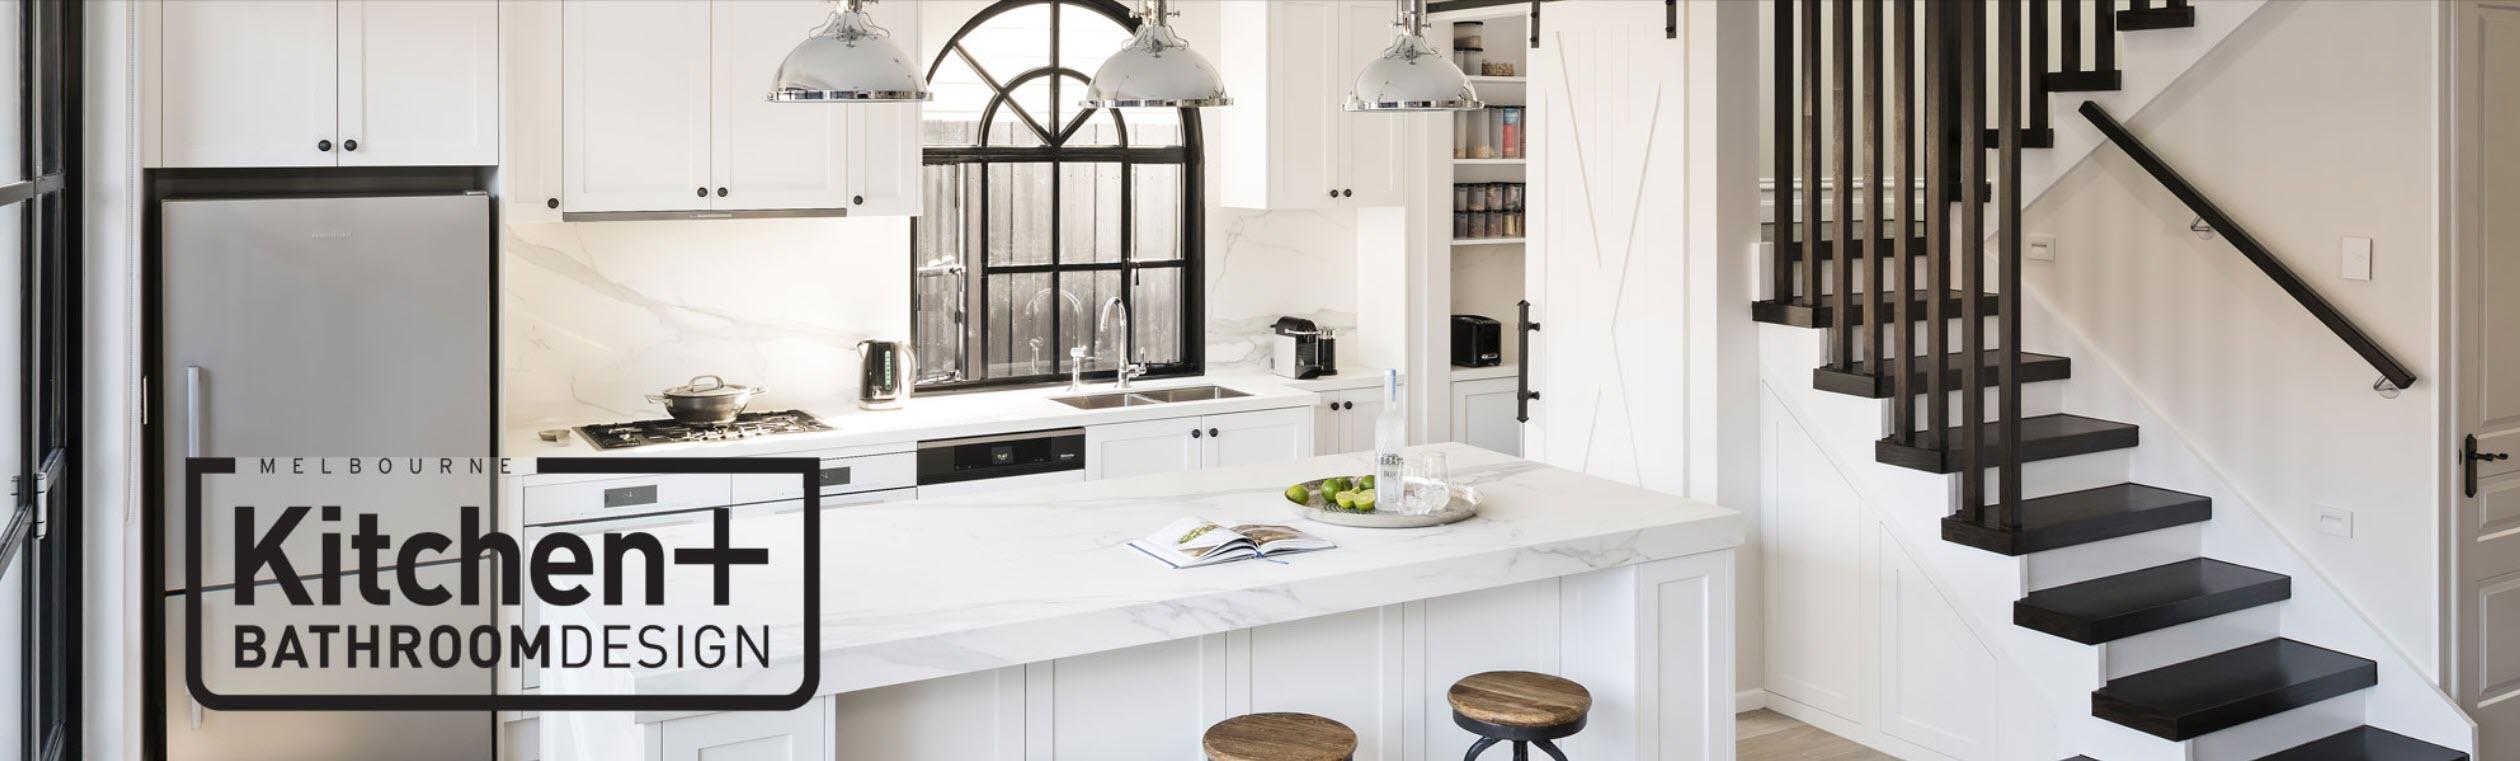 Melbourne Home Kitchen + Bathroom Design